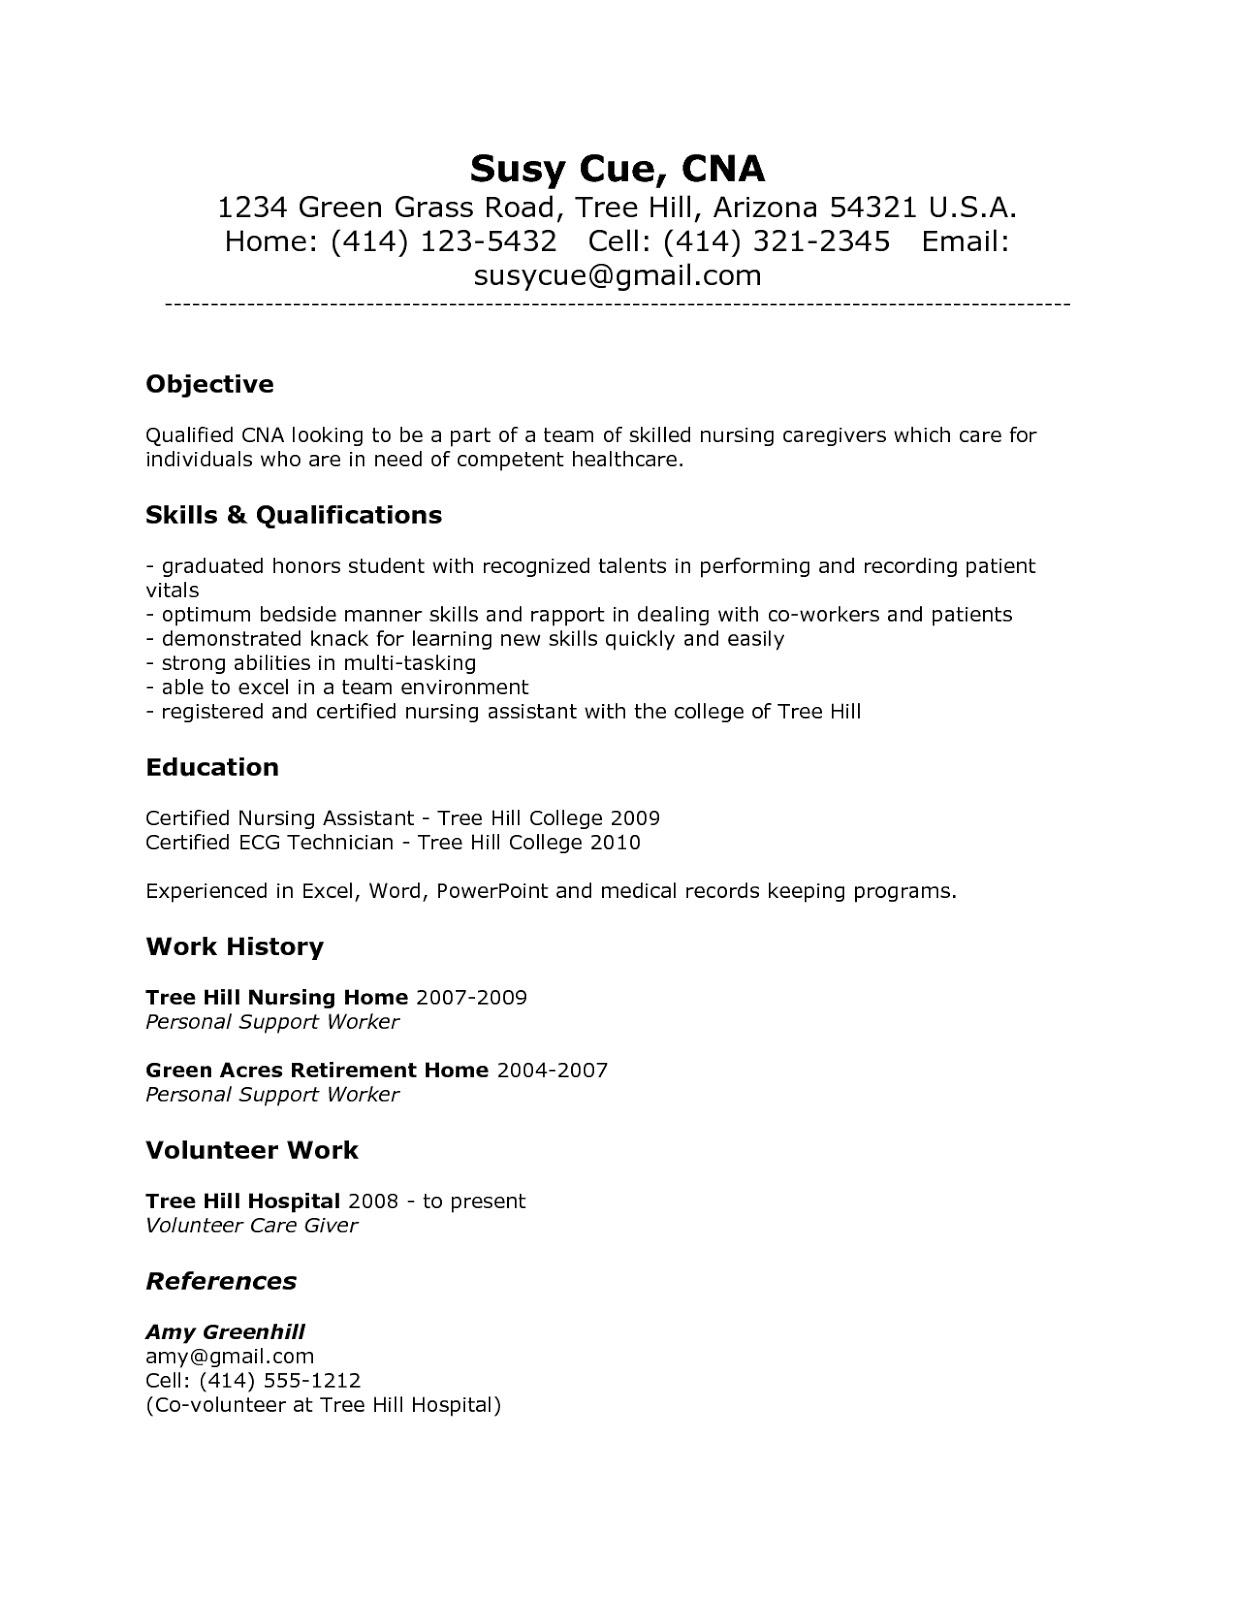 caregiver resume, caregiver resume sample, caregiver resume skills, caregiver resume example, caregiver resume objective, caregiver resume description,